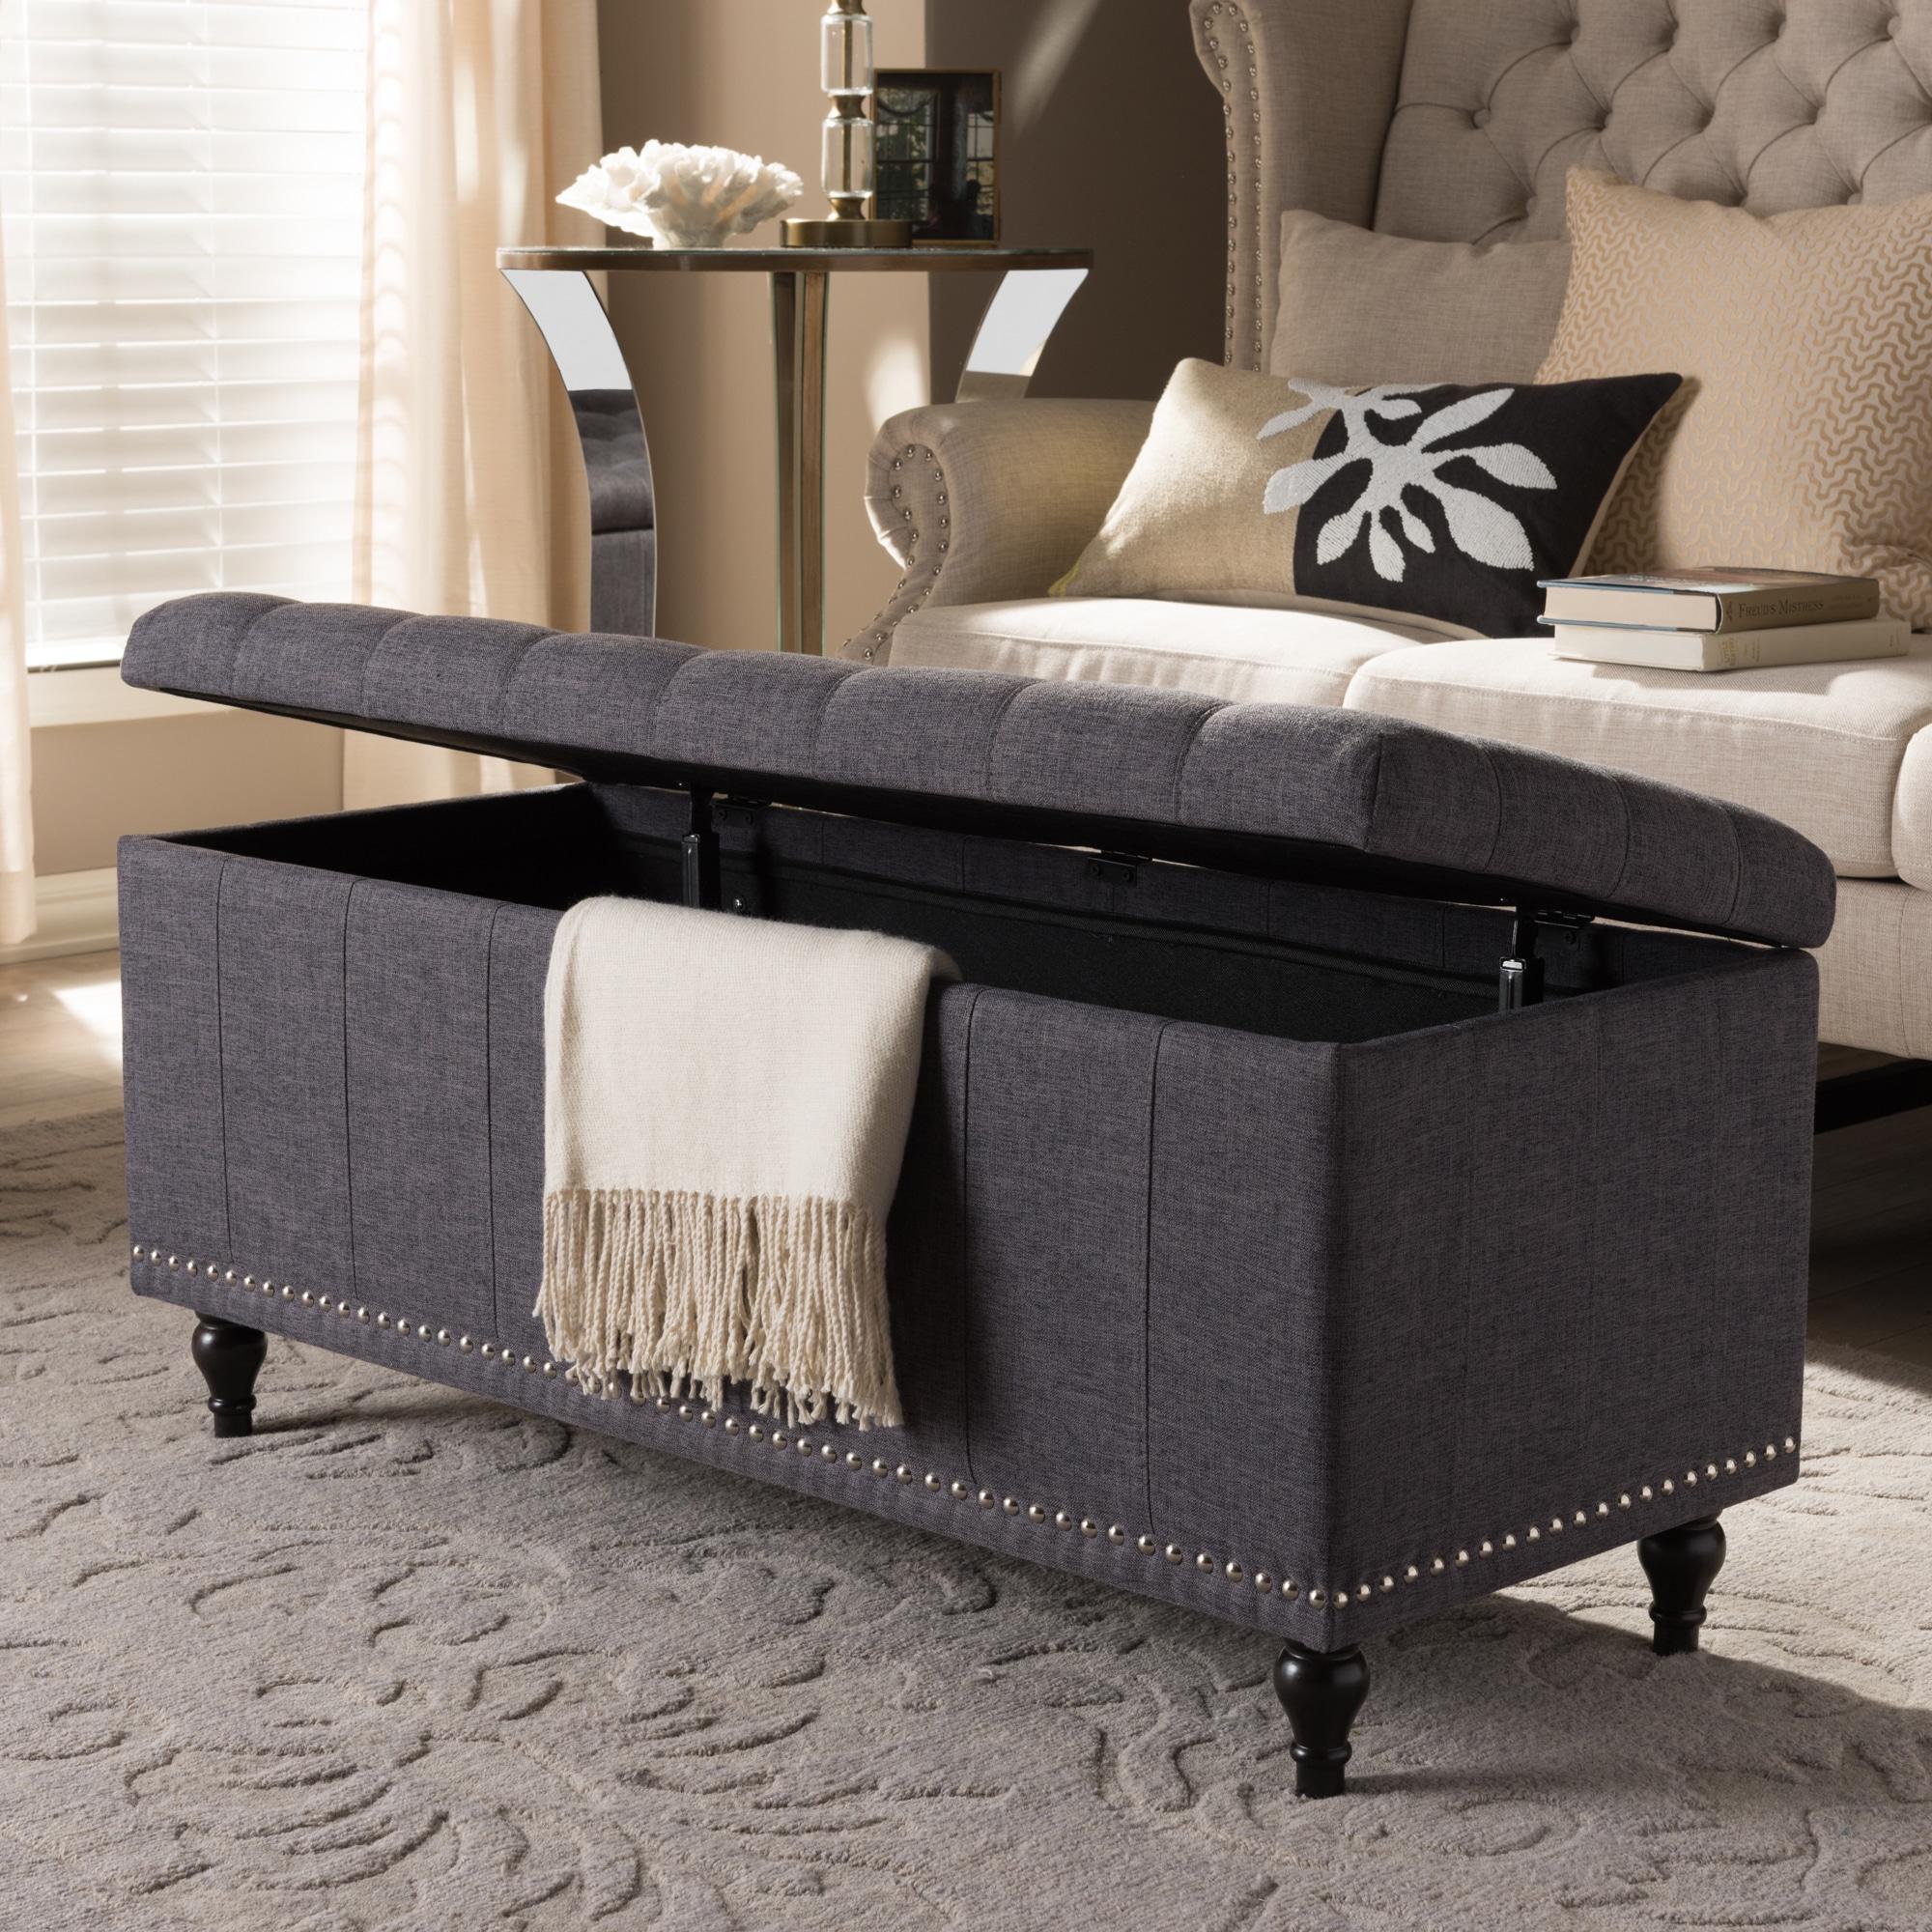 Baxton Studio Alexio Modern Classic Dark Grey Fabric Upholstered Button Tufting Storage Ottoman Bench